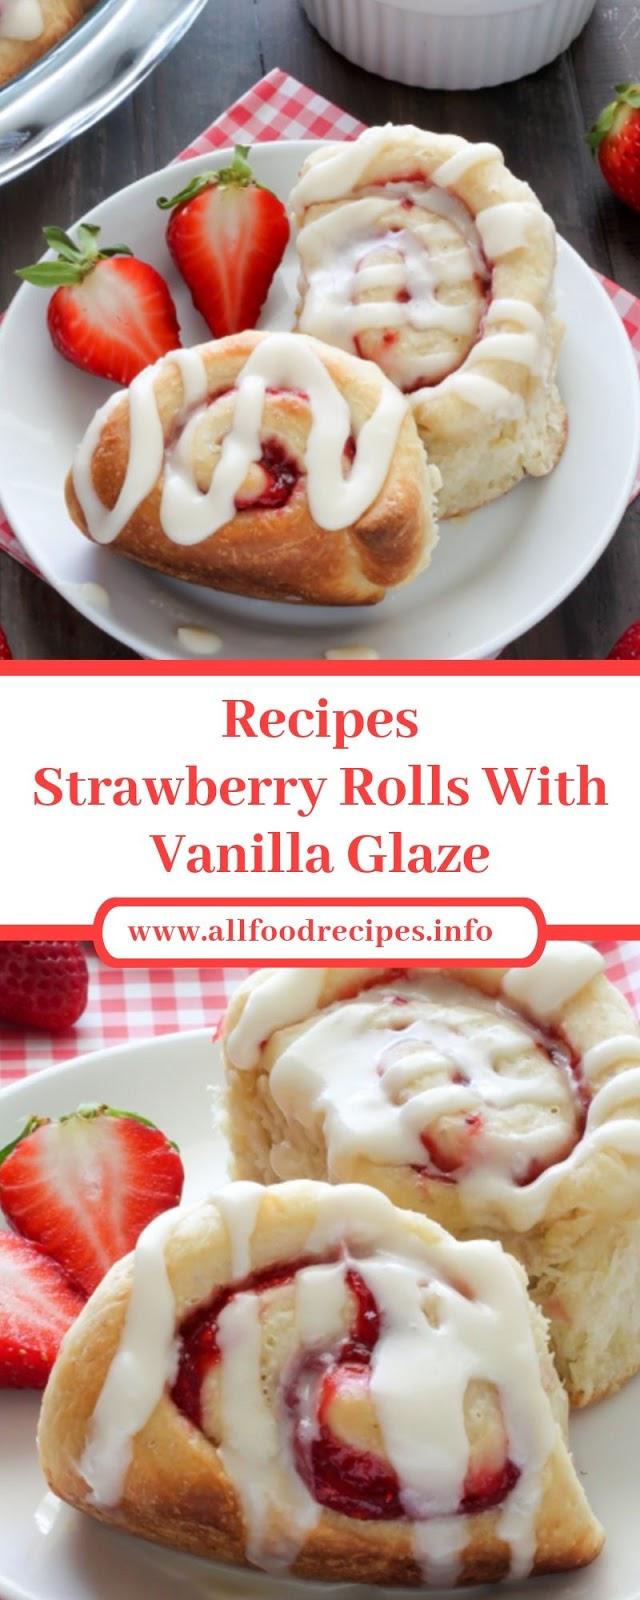 Recipes Strawberry Rolls With Vanilla Glaze